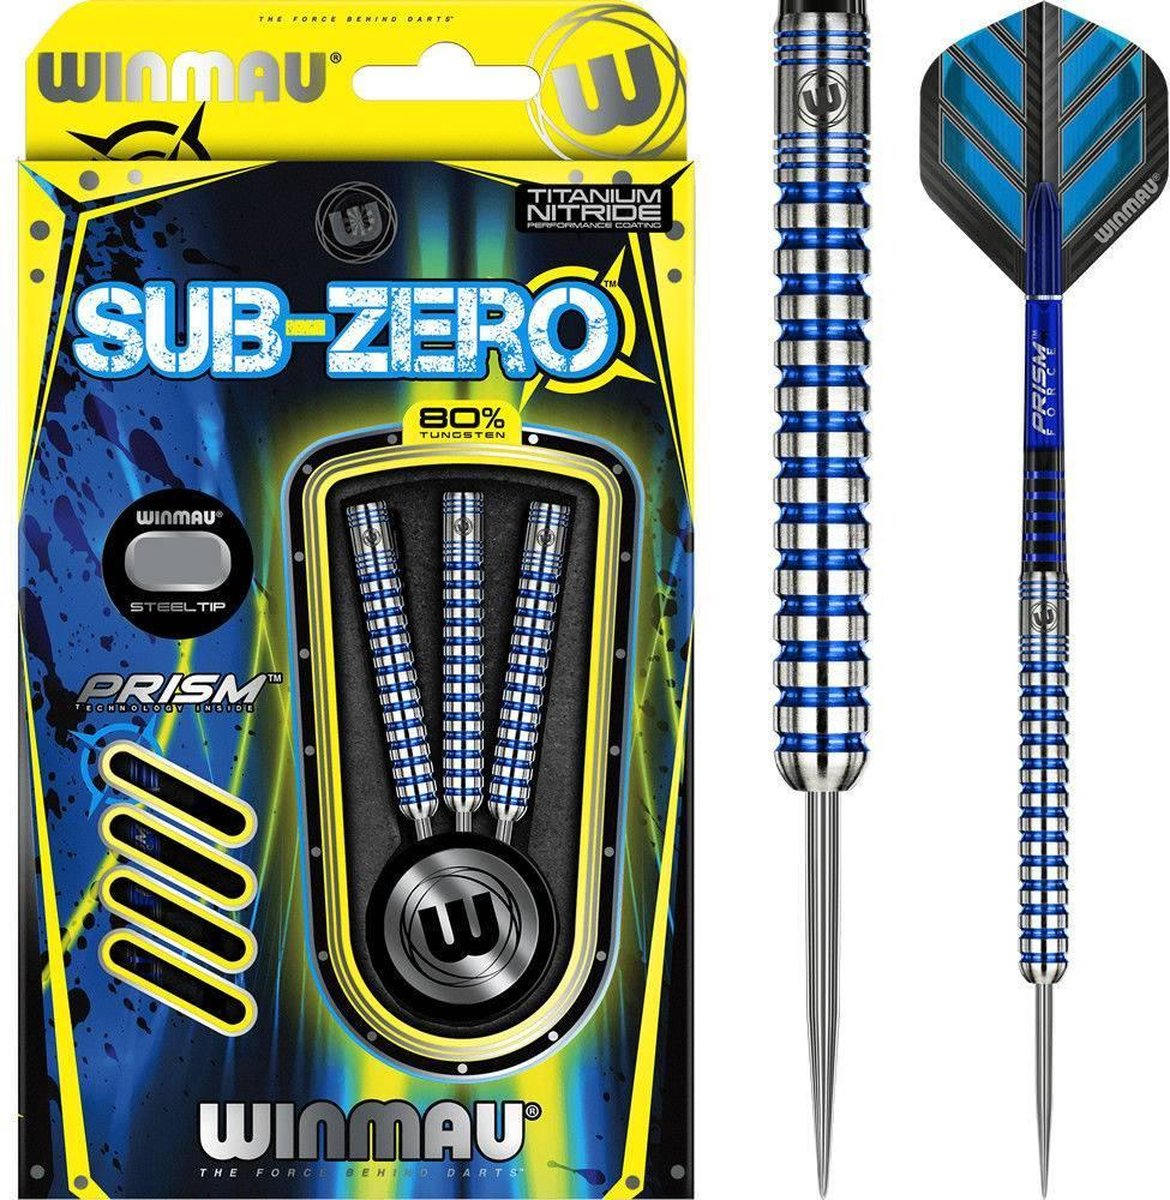 Winmau Subzero 80% Straight - 24 Gram